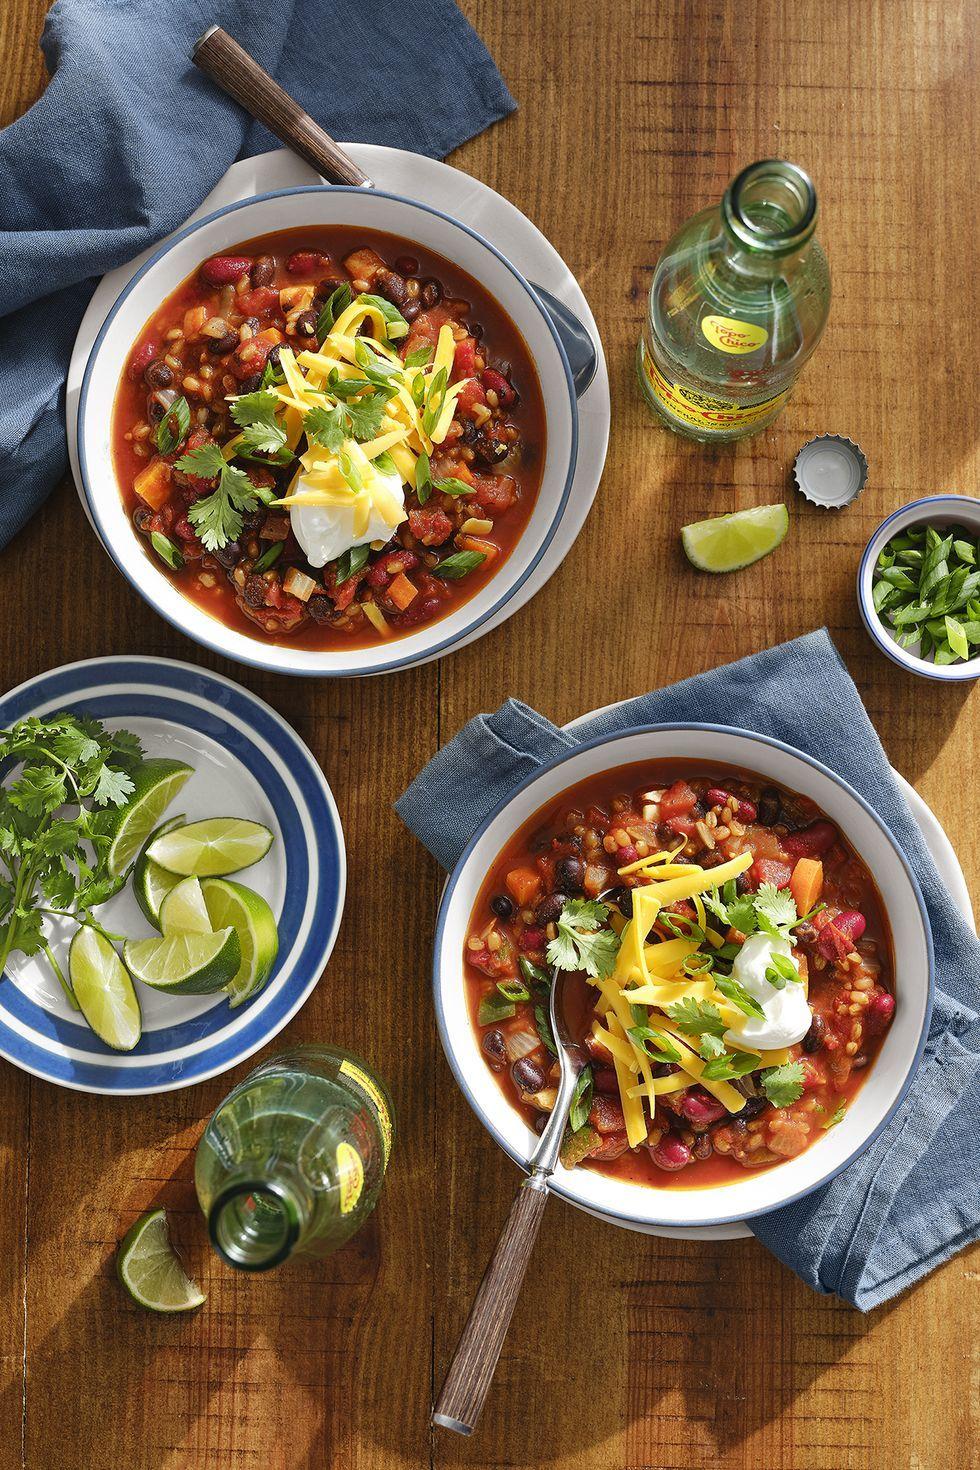 77 Healthy Crock Pot Recipes Easy Slow Cooker Dinner Ideas